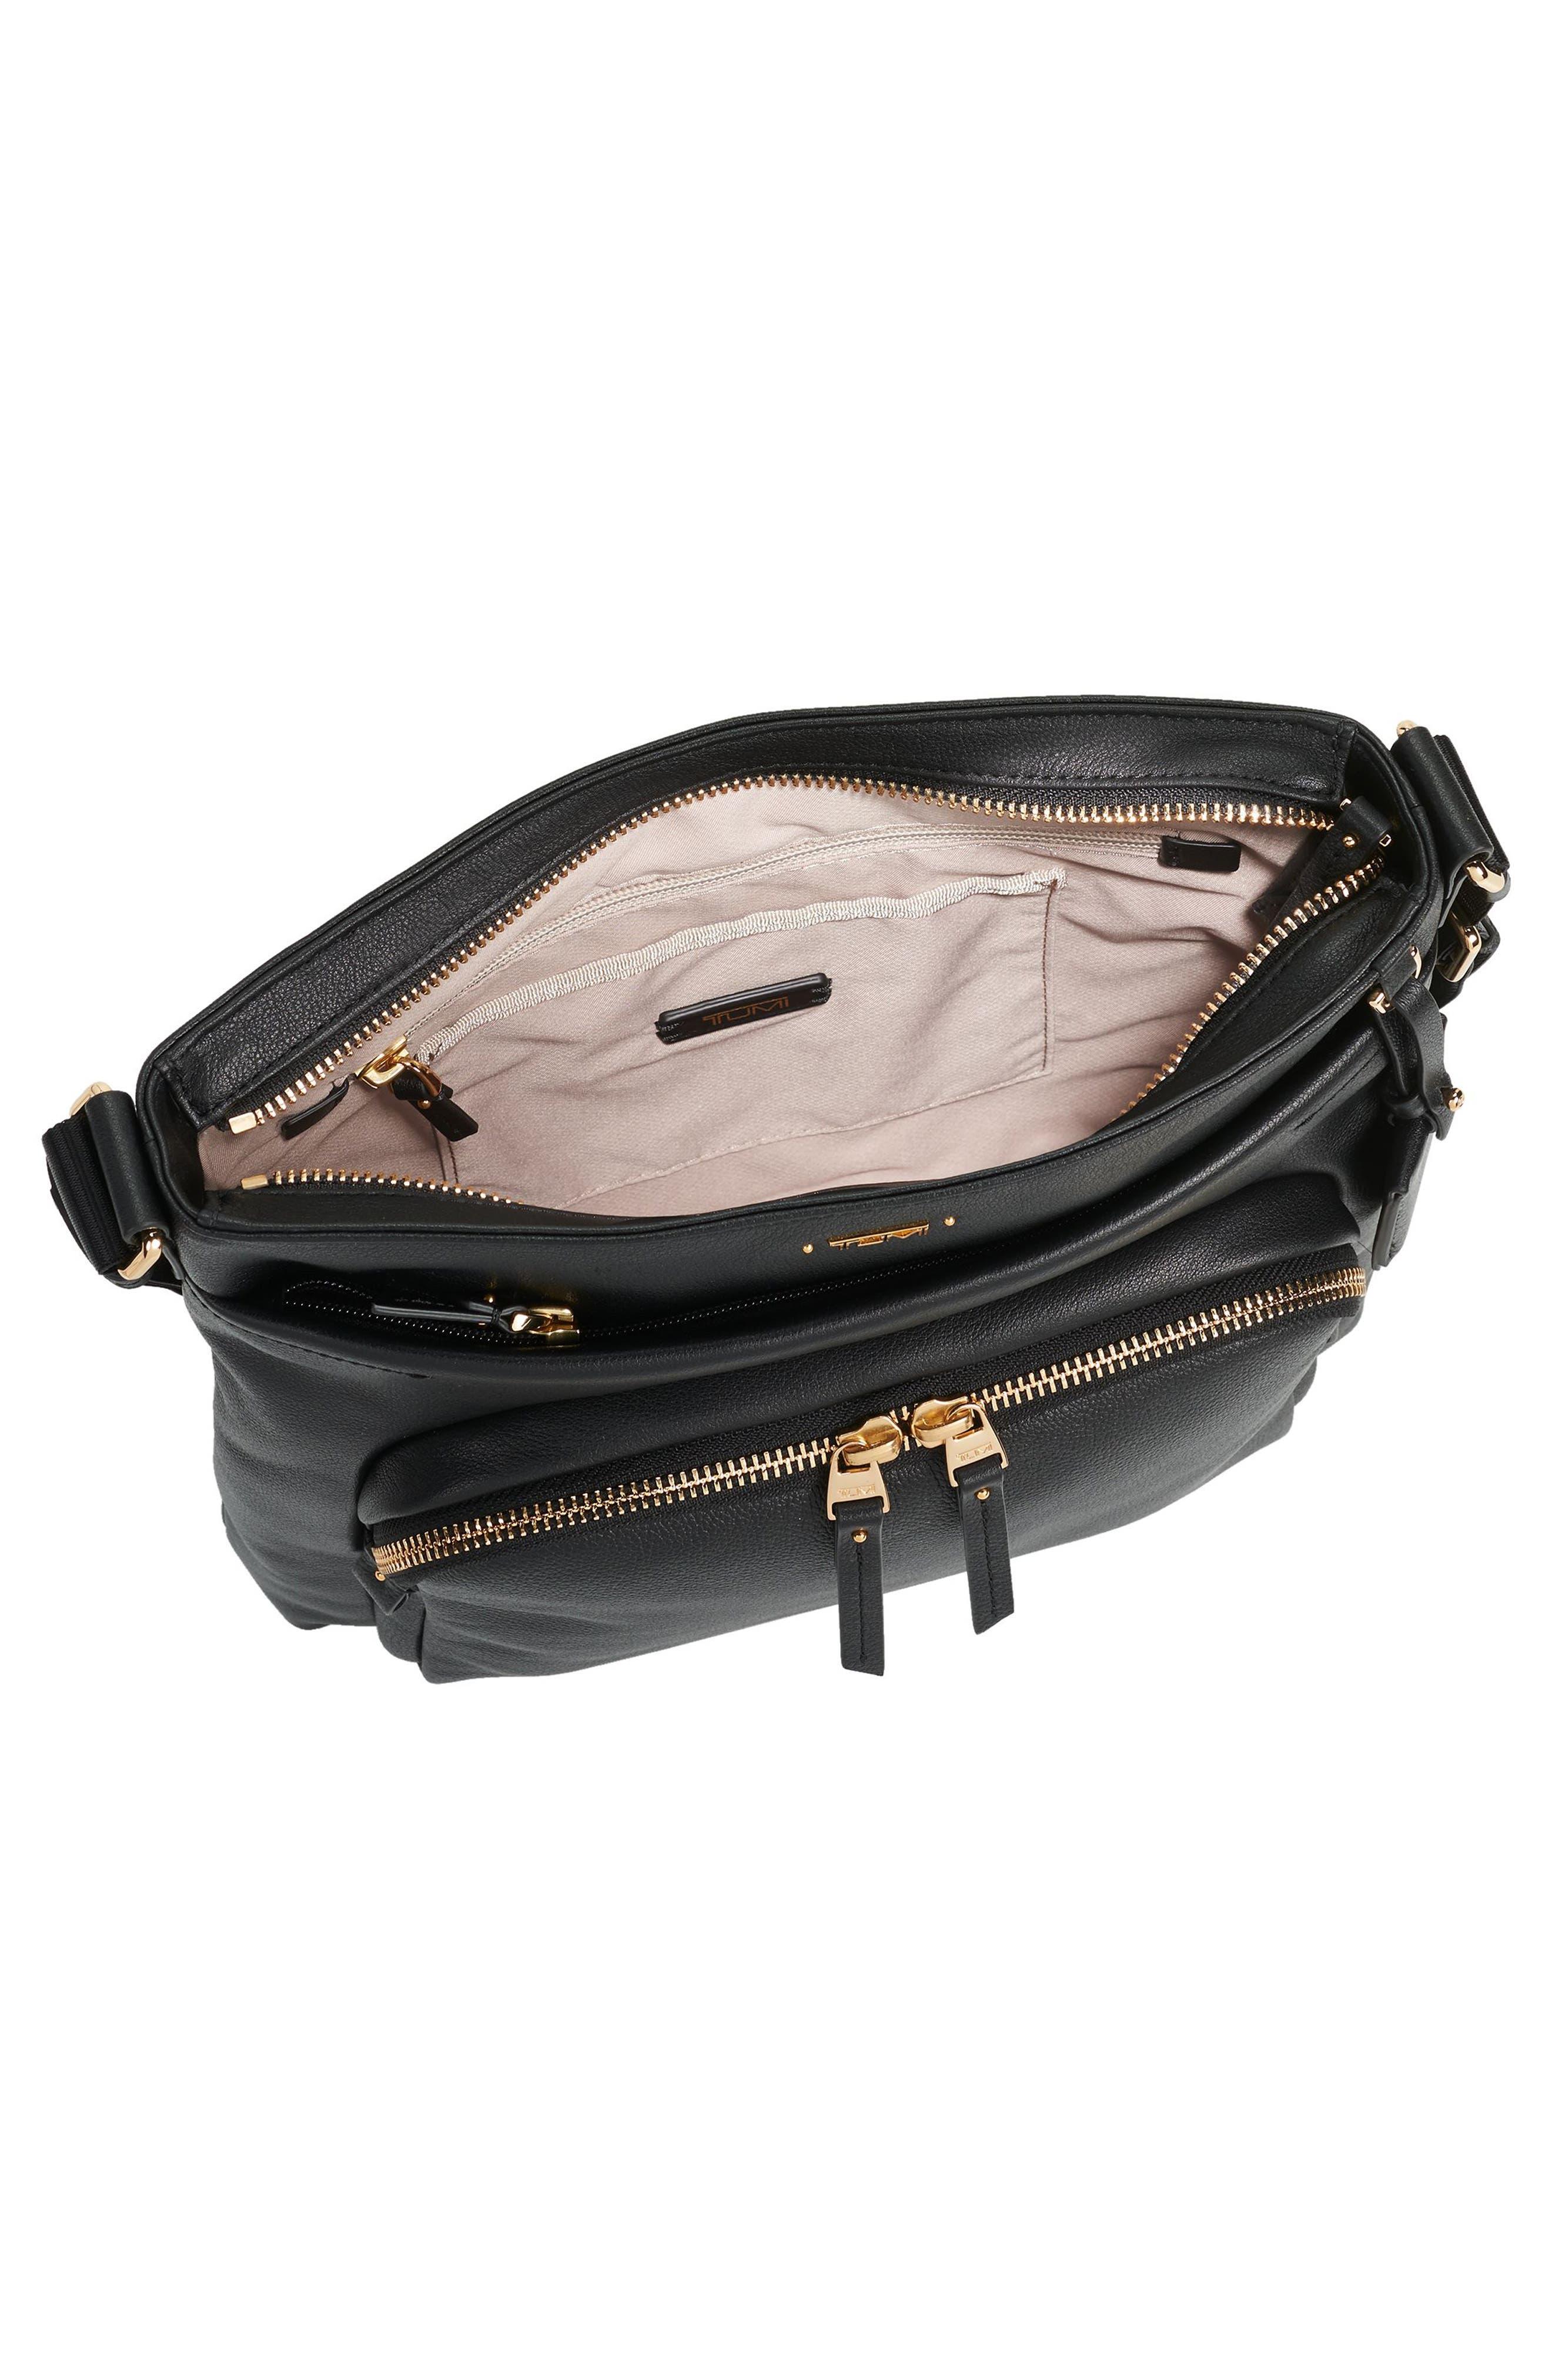 Voyageur - Capri Leather Crossbody Bag,                             Alternate thumbnail 3, color,                             Black